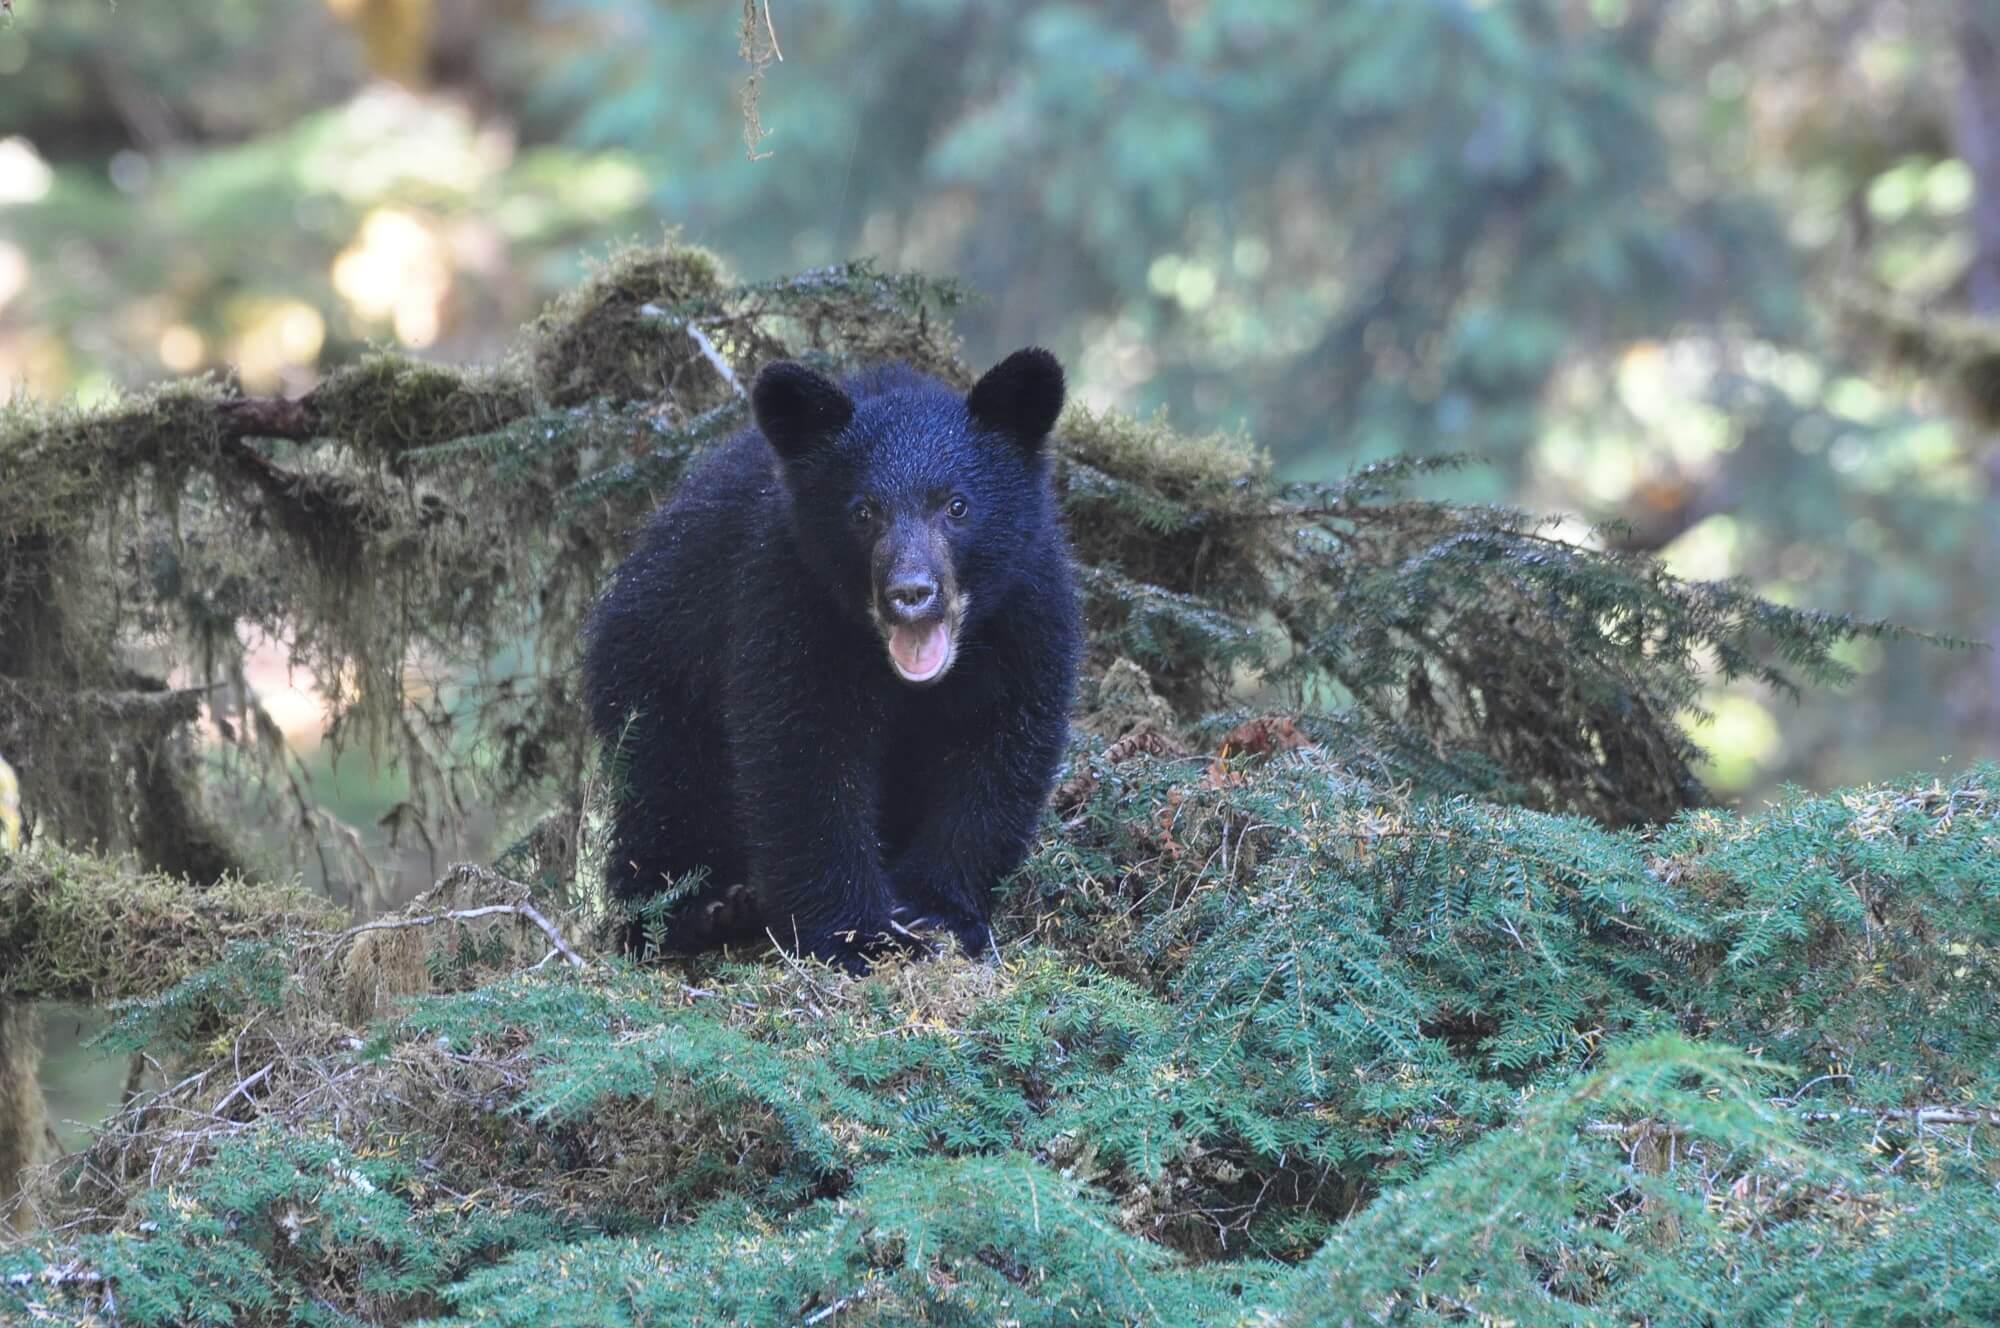 https://www.kawanti.com/wp-content/uploads/2018/10/Alaska-Bear-cub.jpg